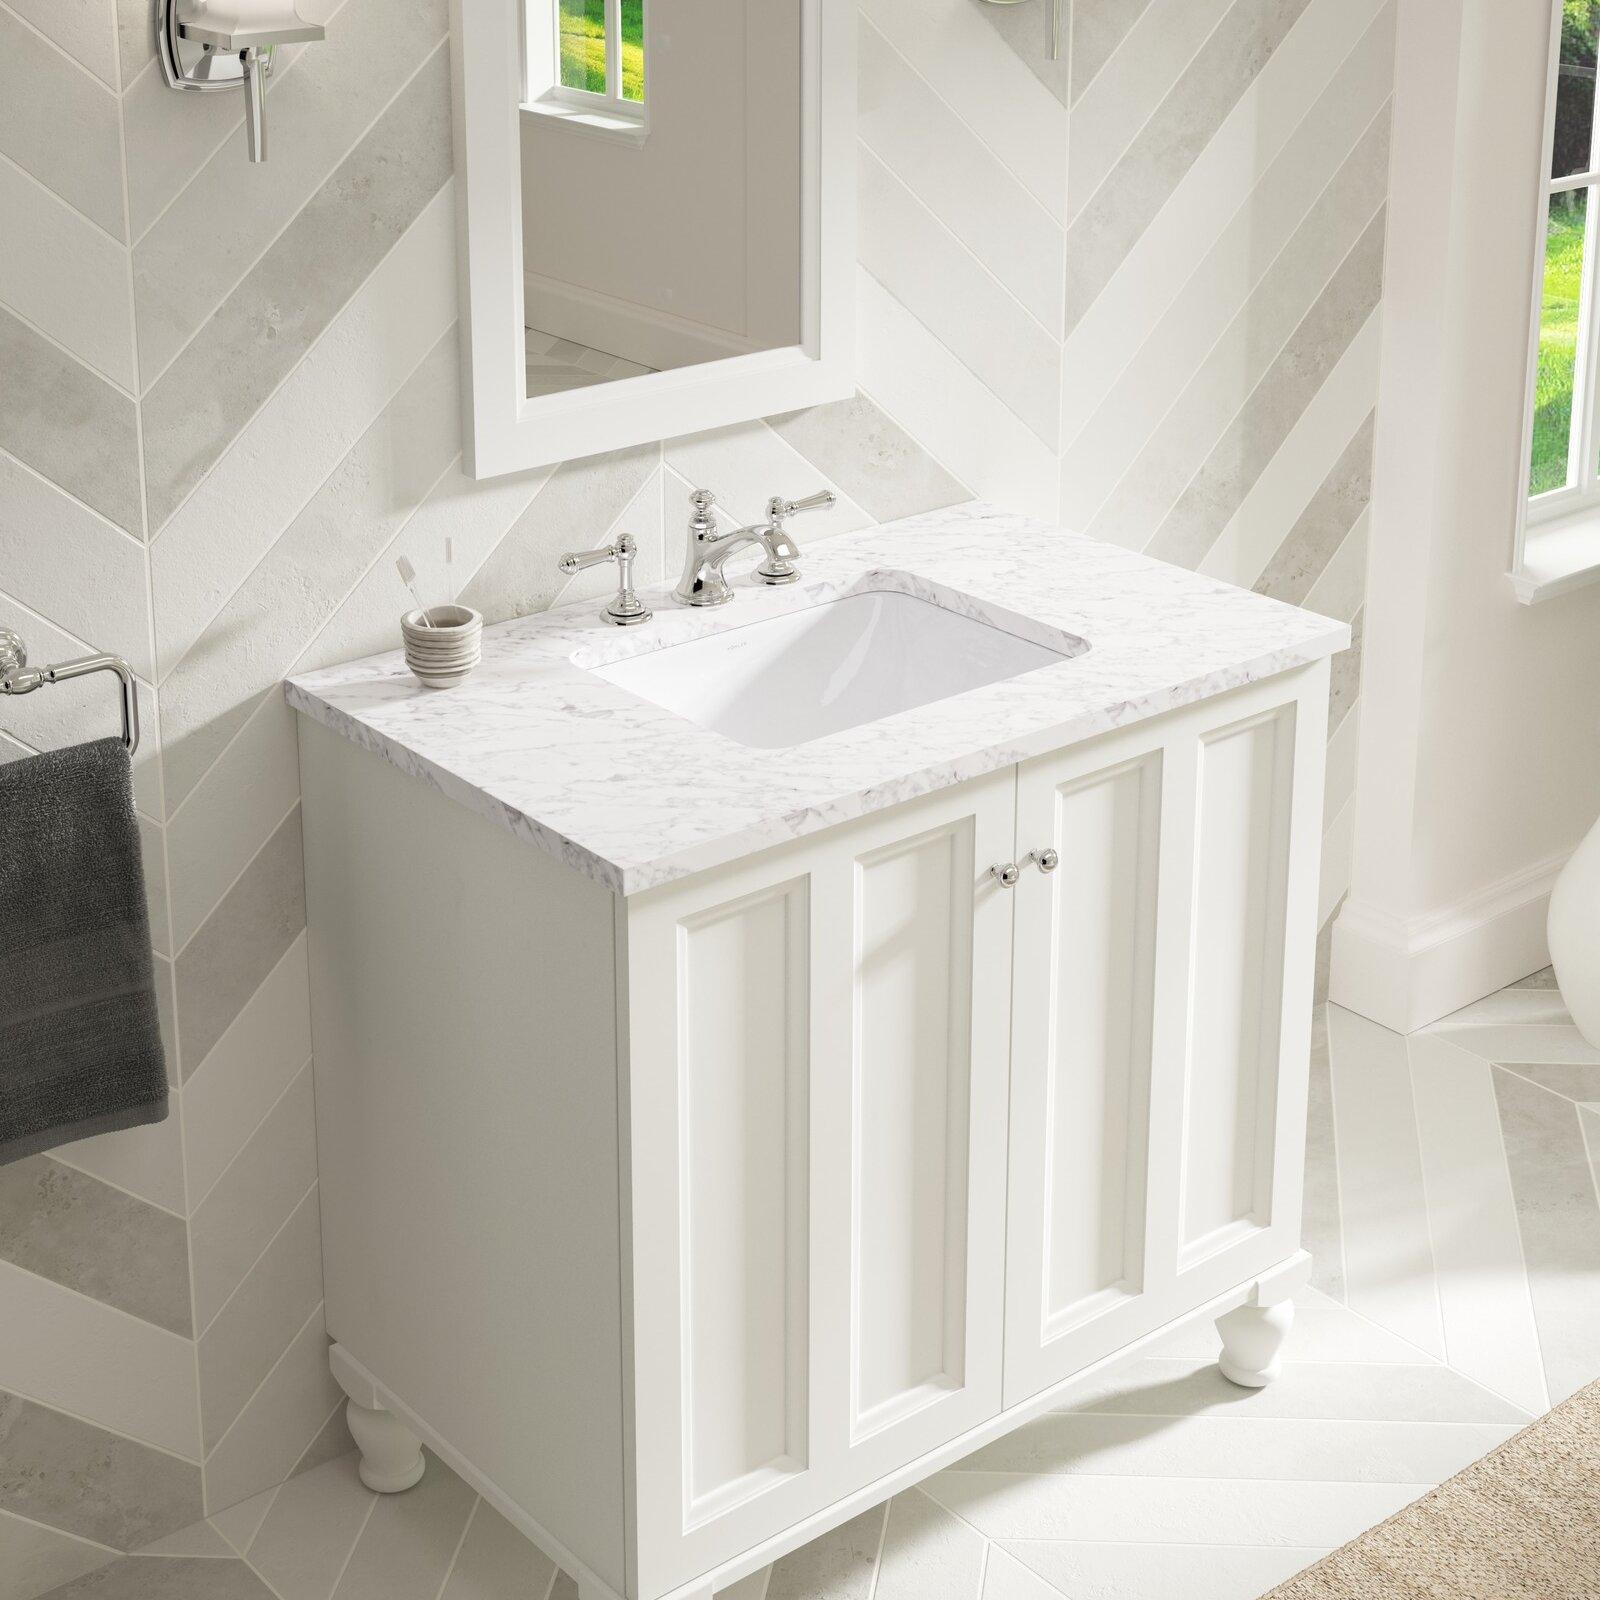 Luxury Rectangular Bathroom Sink Beautiful